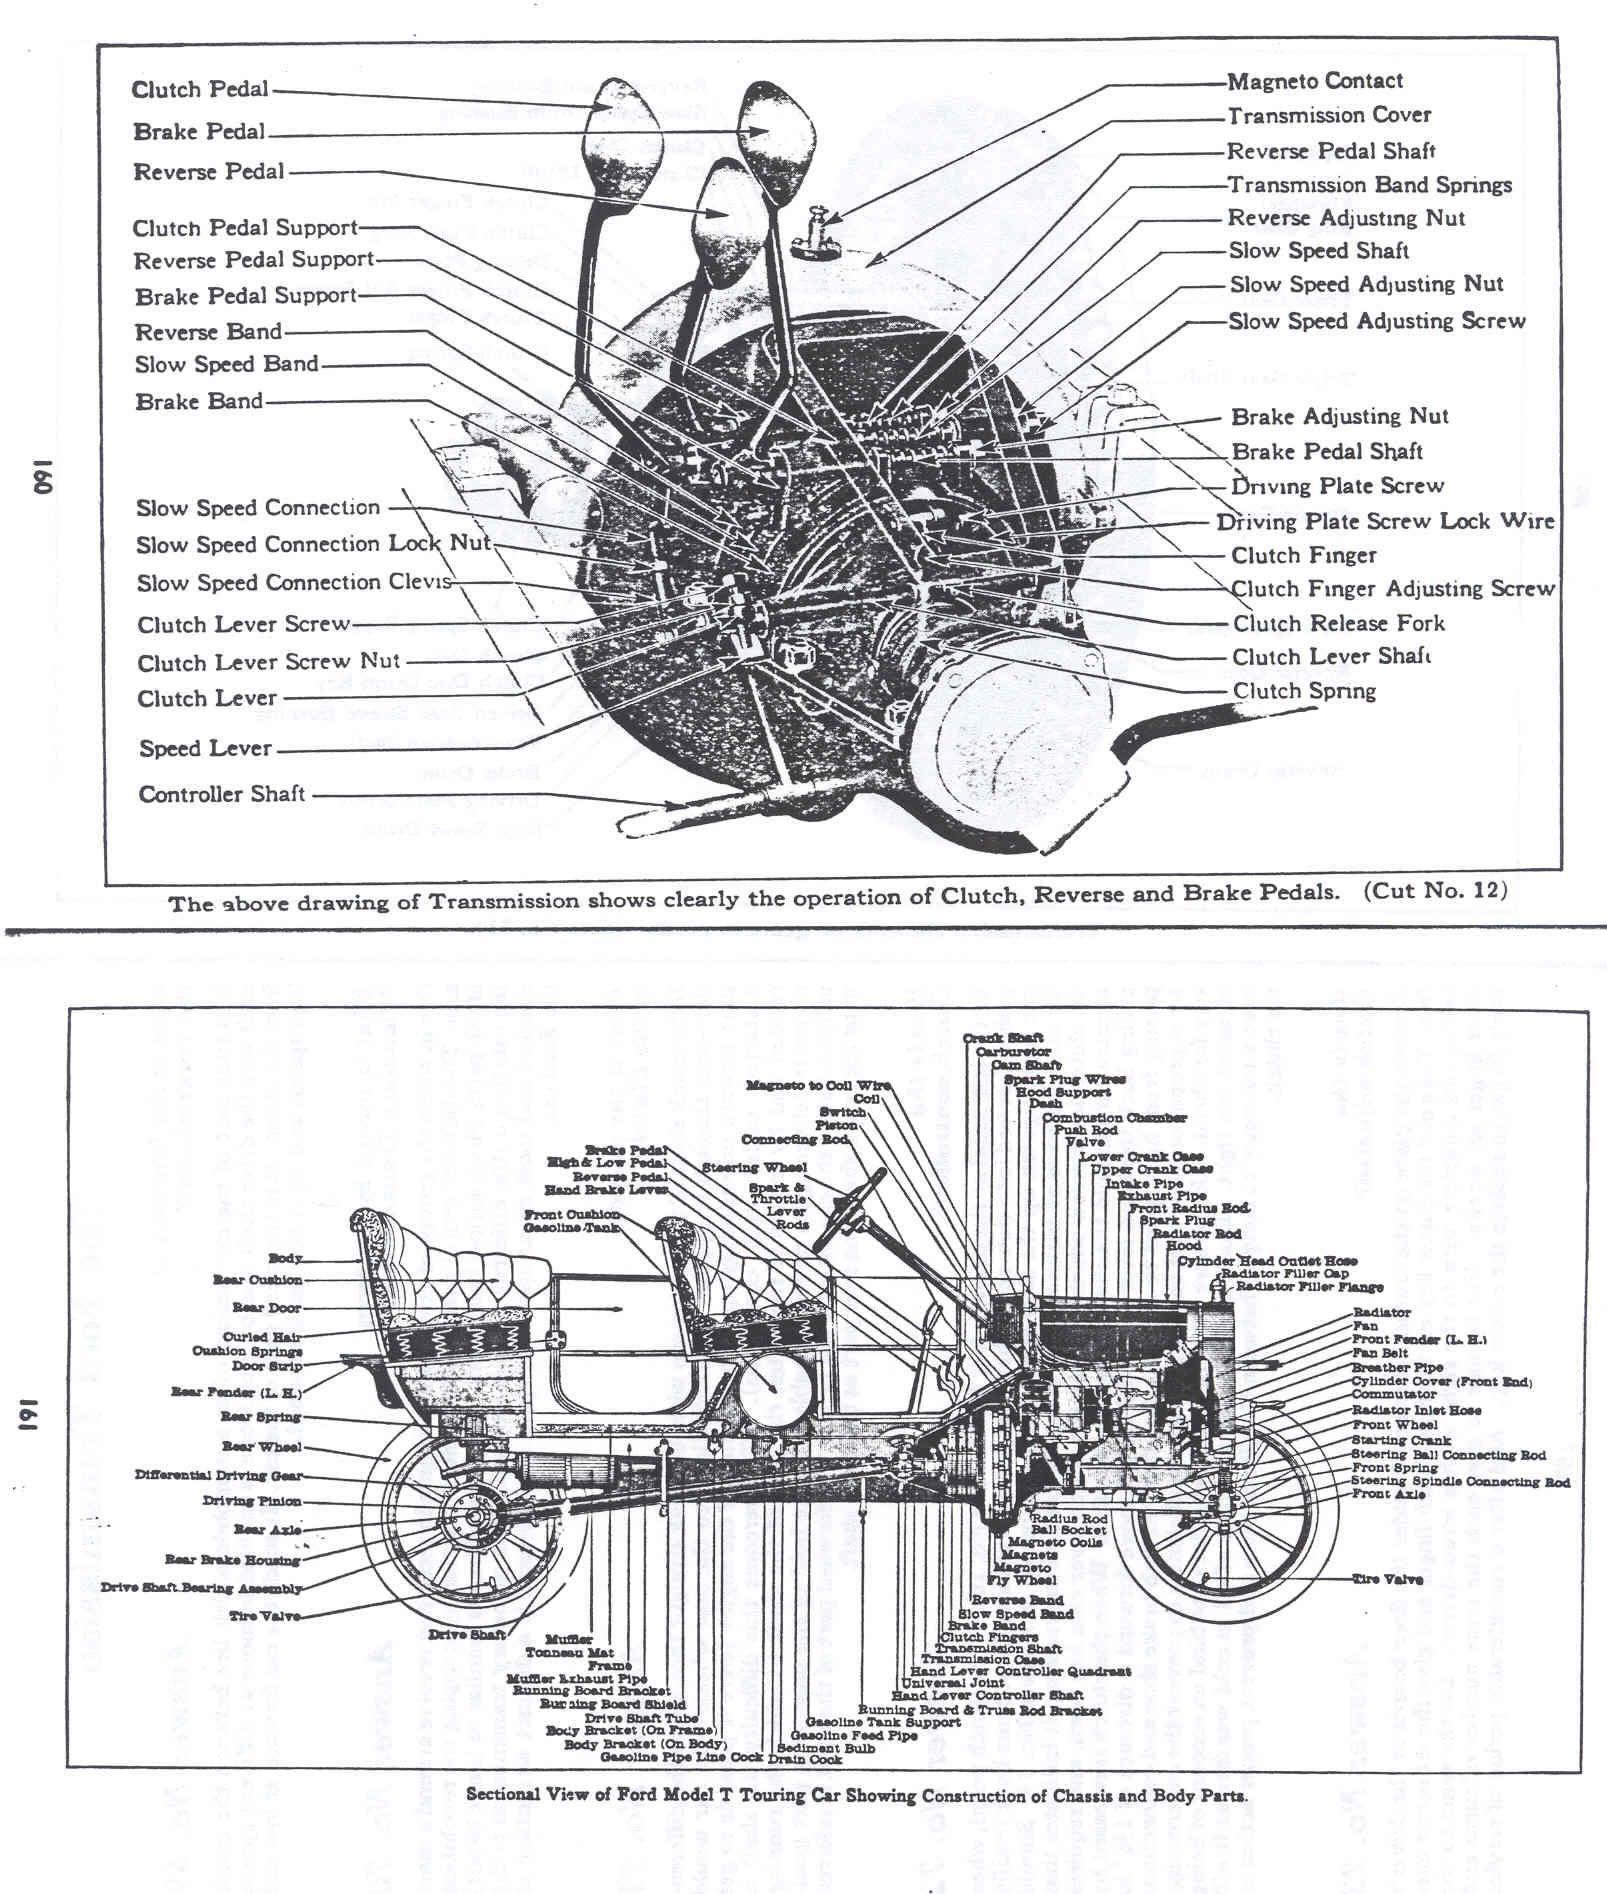 Model T Manual / Model T 160_61.jpg